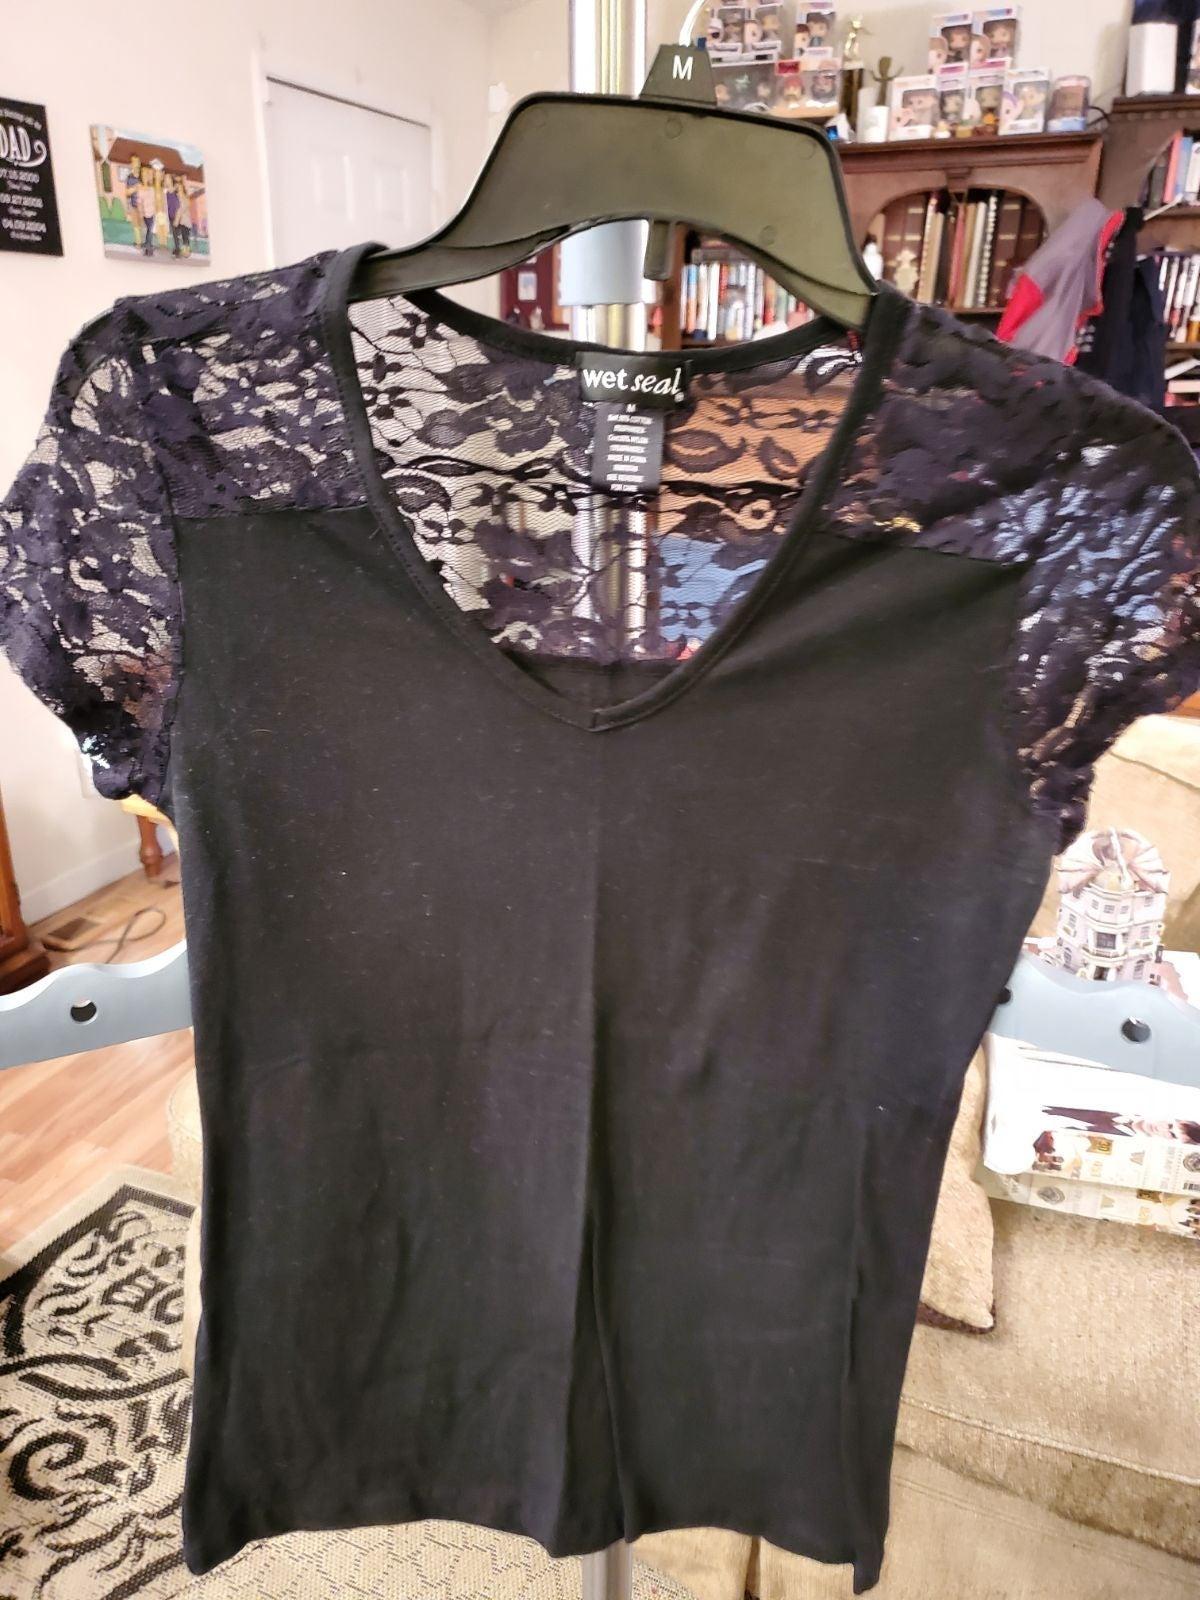 Wet Seal Black Lace Shirt